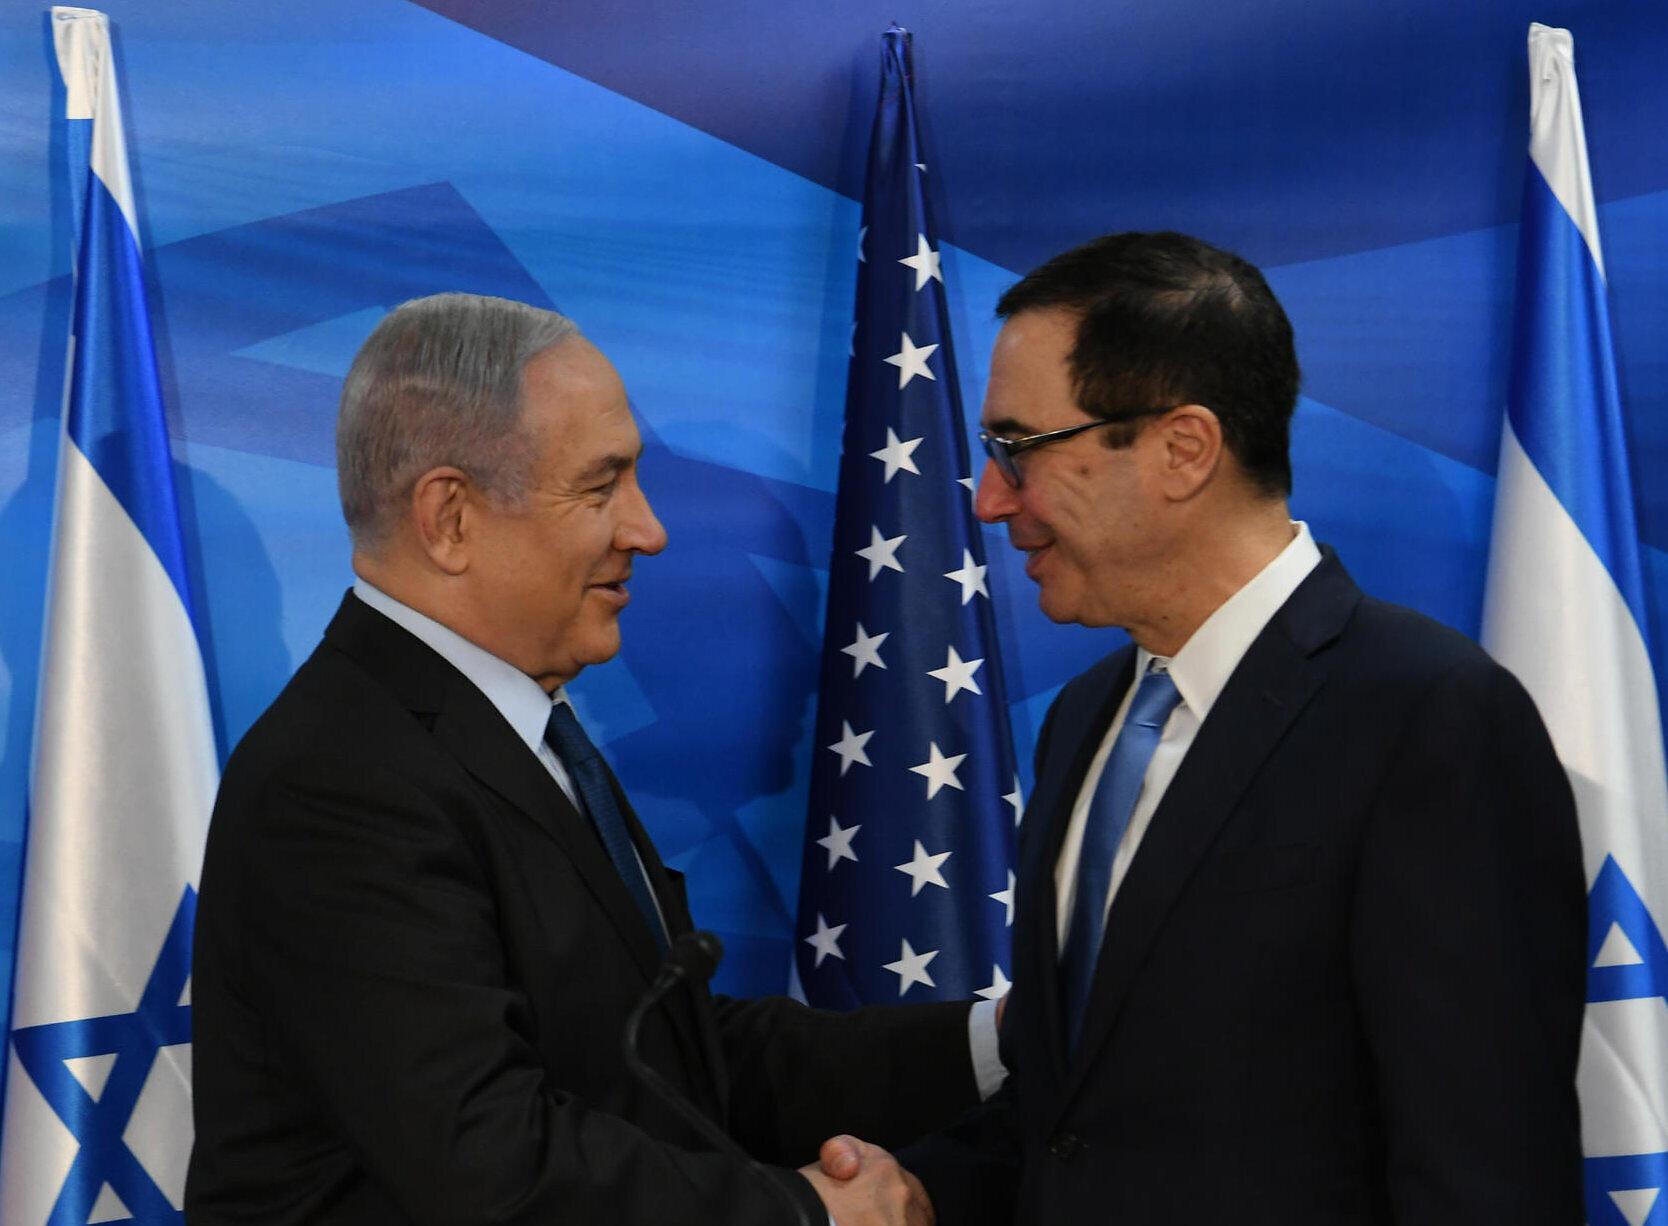 Netanyahu Accuses Iran Of Preparing Precision Missiles To Strike Israel